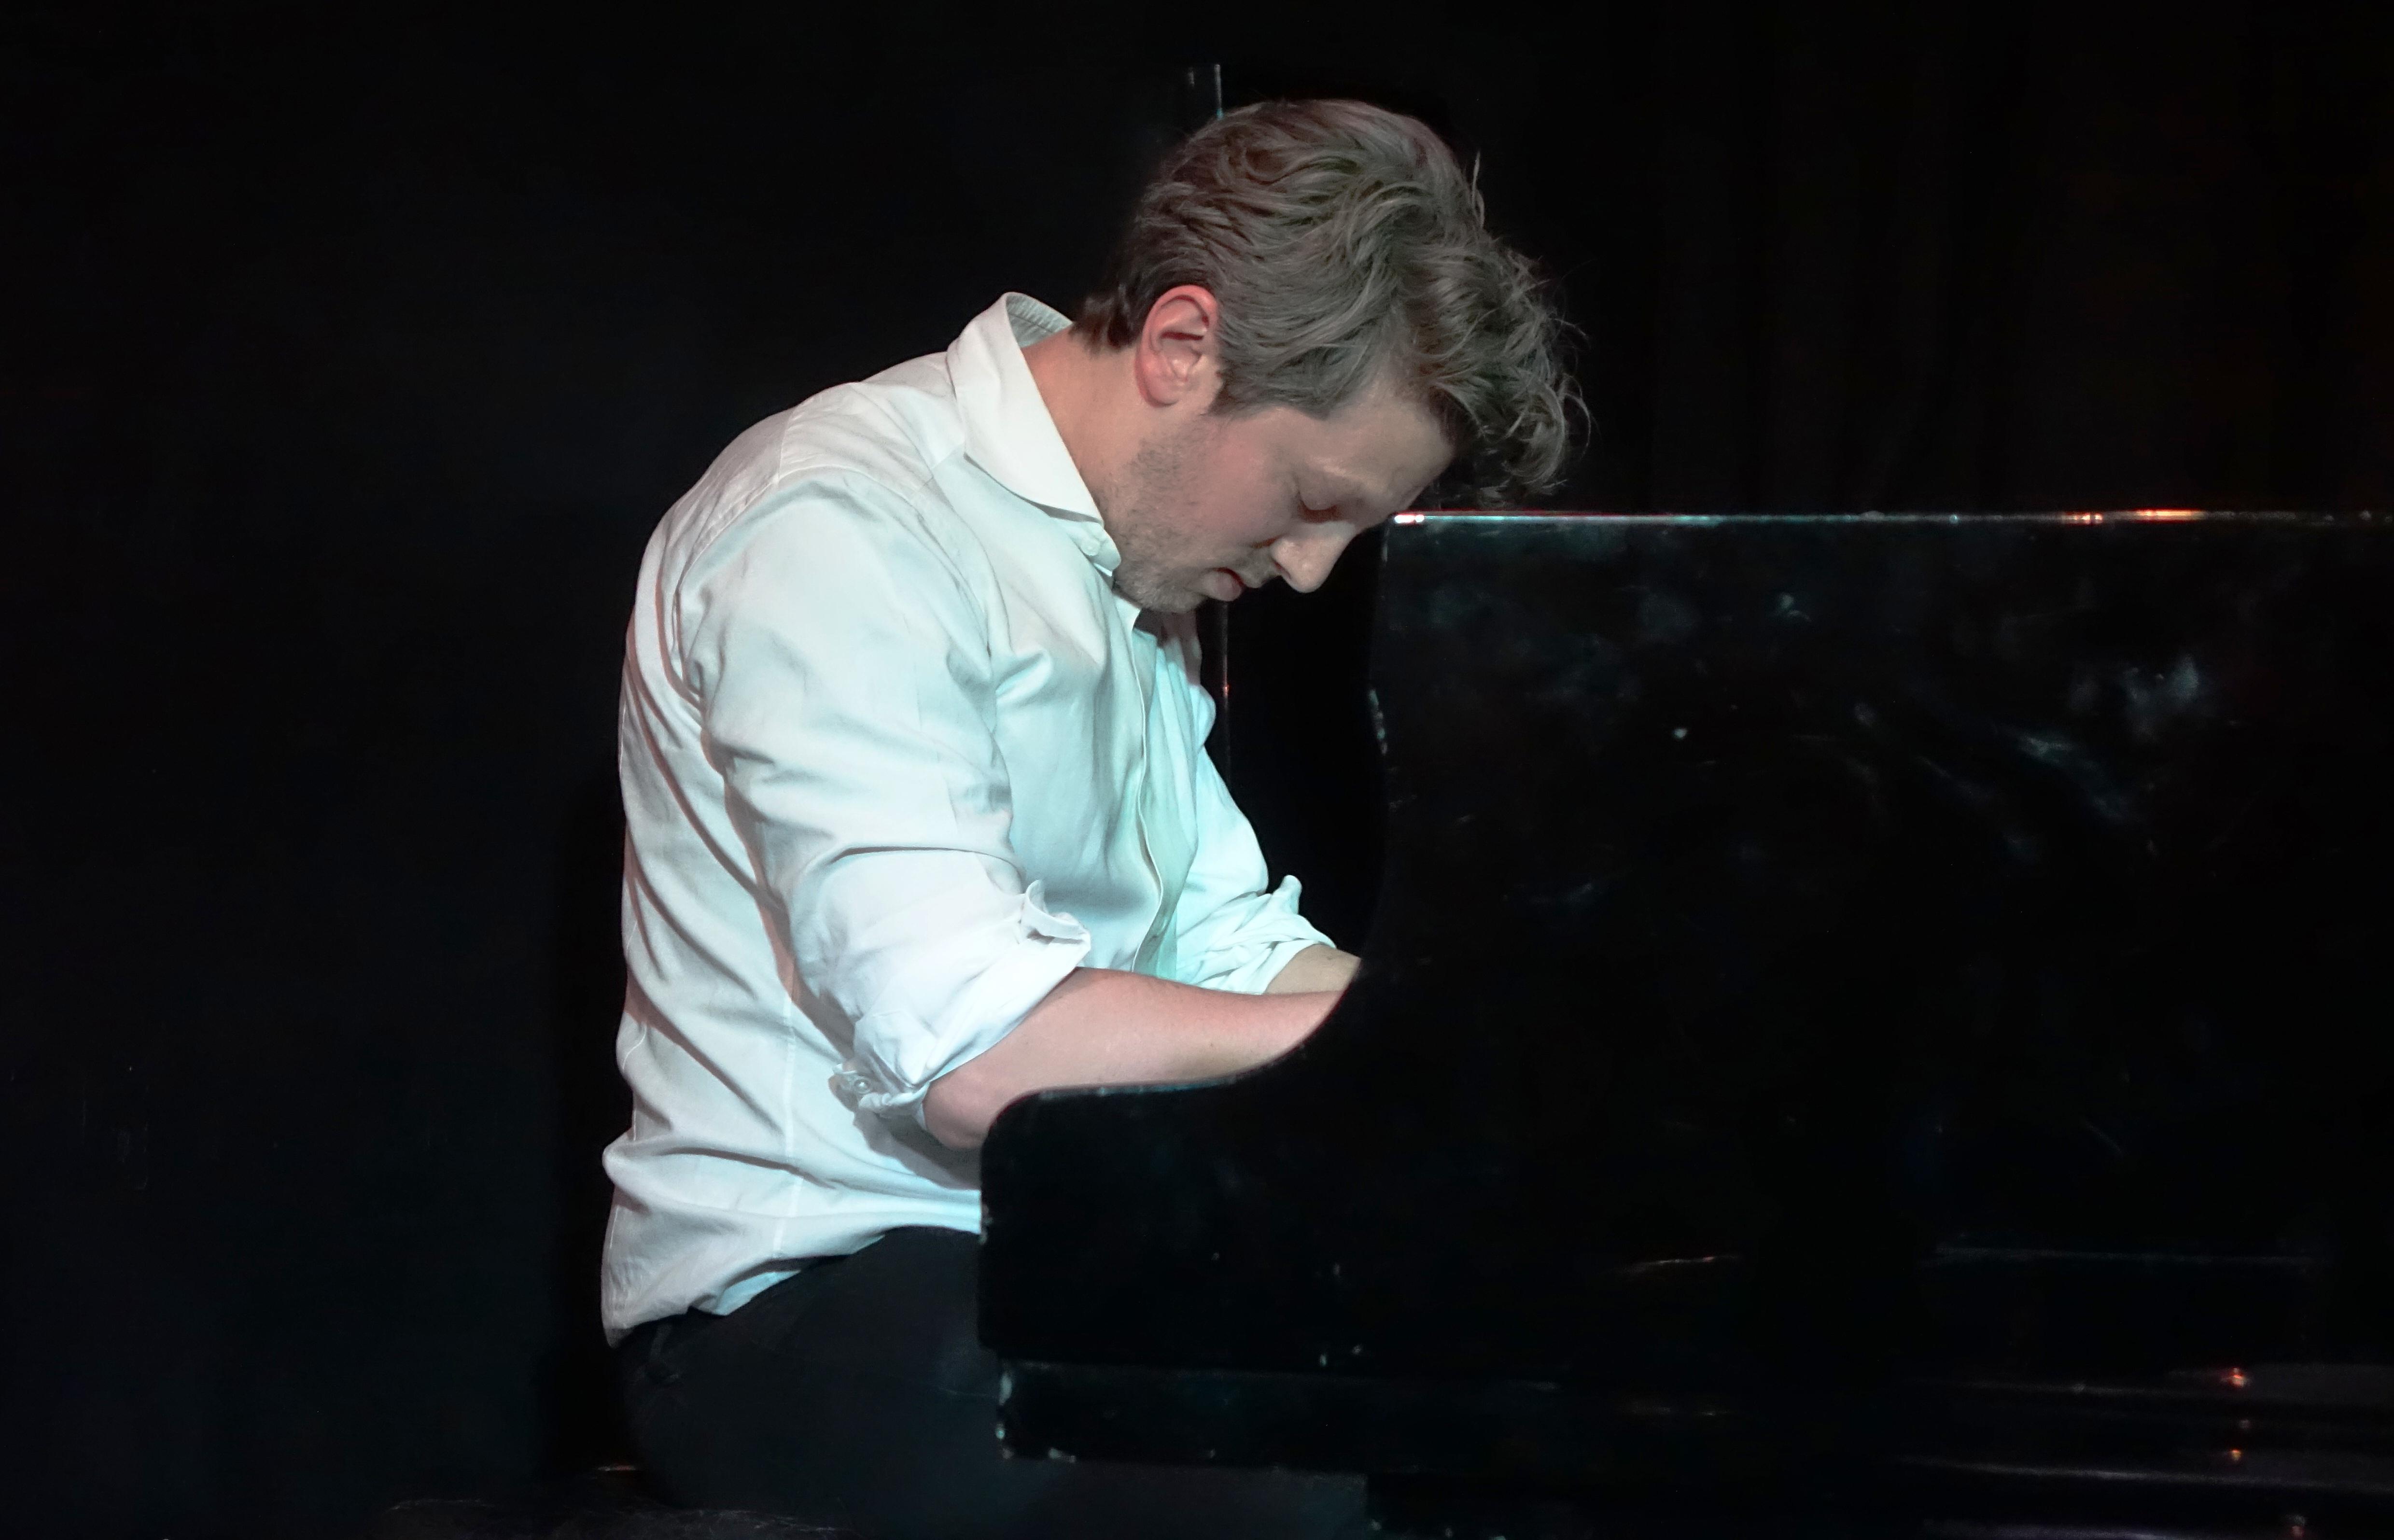 Corey Smythe at the Vortex, London in December 2017